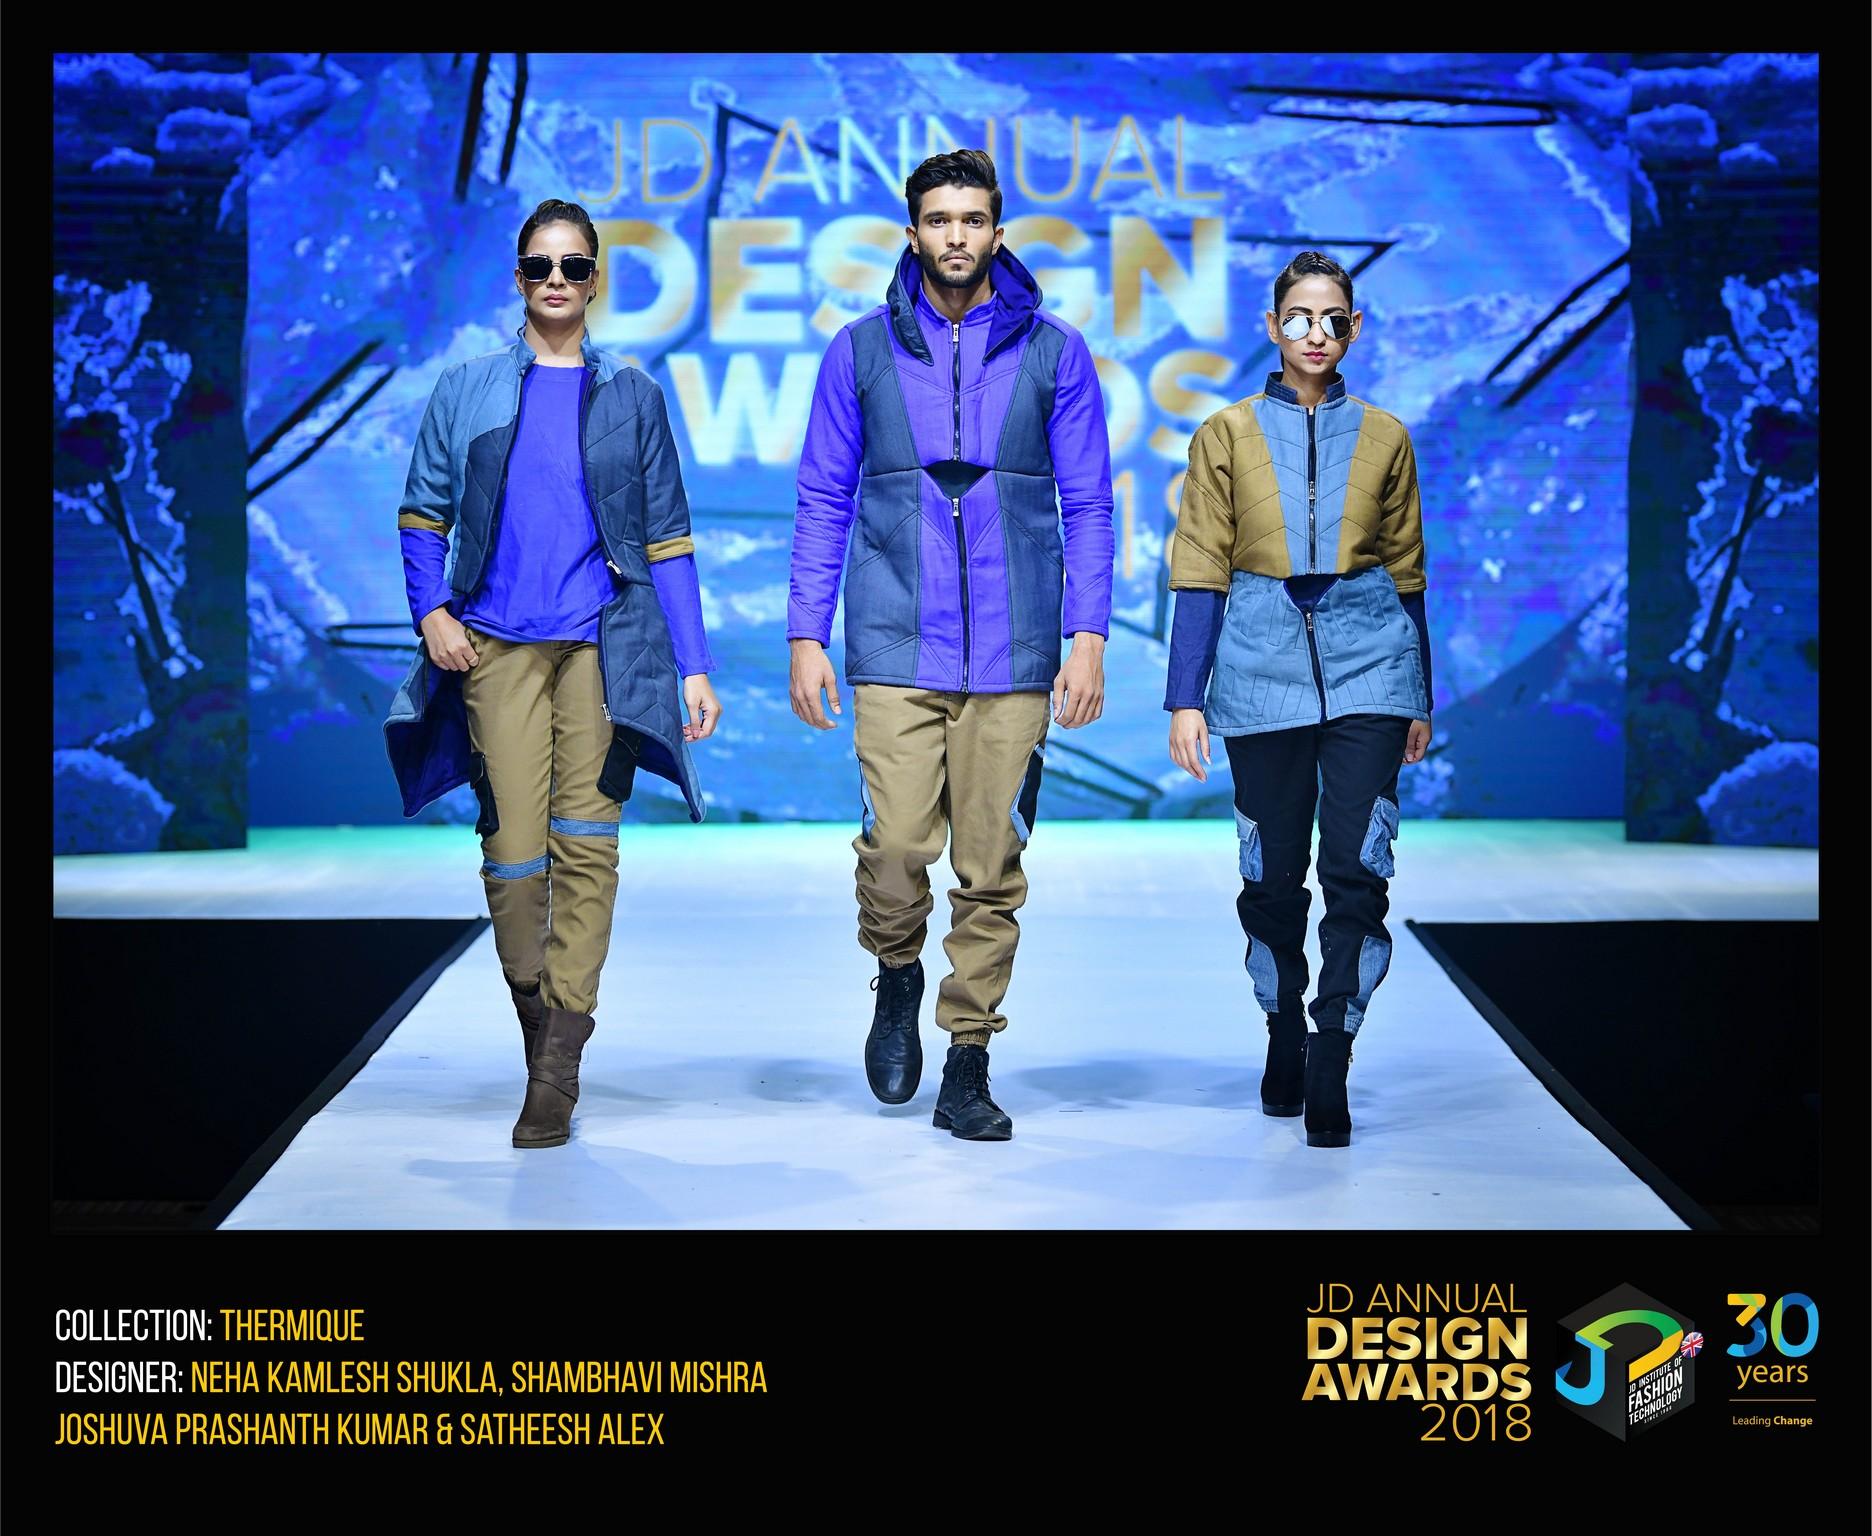 Thermique – Change – JD Annual Design Awards 2018 | Designer: Shambhavi, Neha and satish | Photography : Jerin Nath (@jerin_nath) thermique - THERMIQUE 9 - Thermique – Change – JD Annual Design Awards 2018